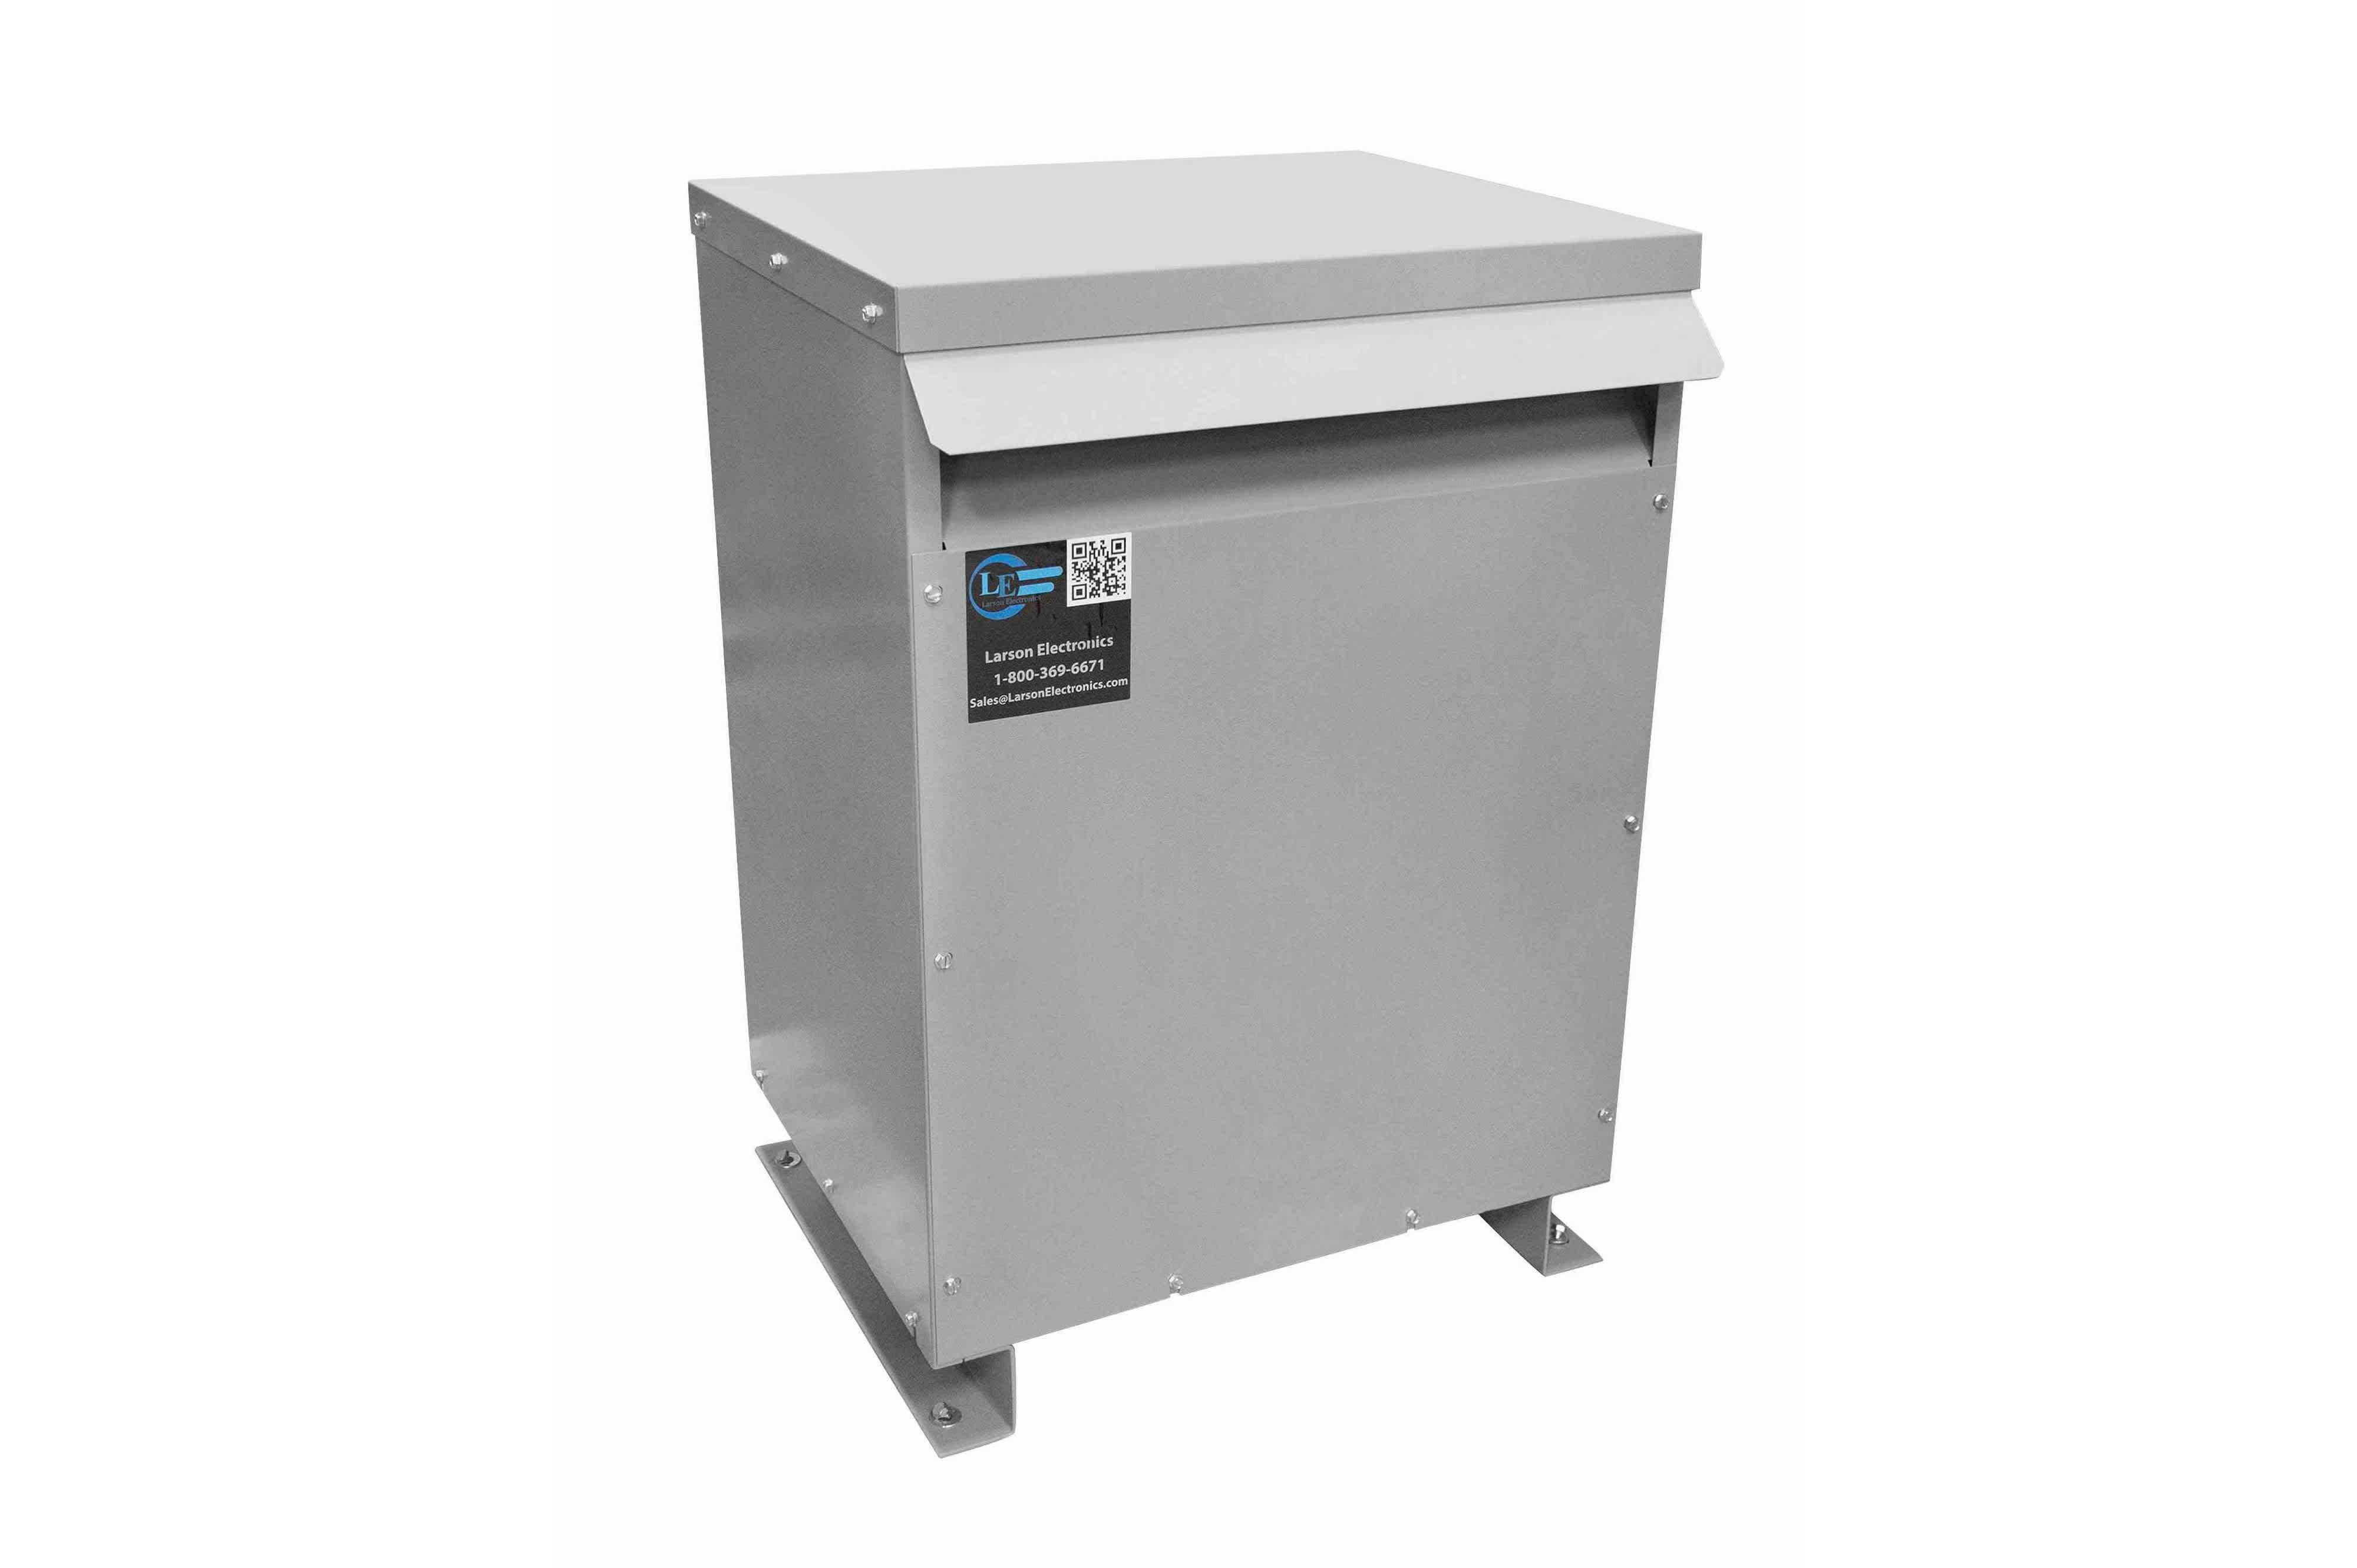 150 kVA 3PH Isolation Transformer, 480V Wye Primary, 240V/120 Delta Secondary, N3R, Ventilated, 60 Hz